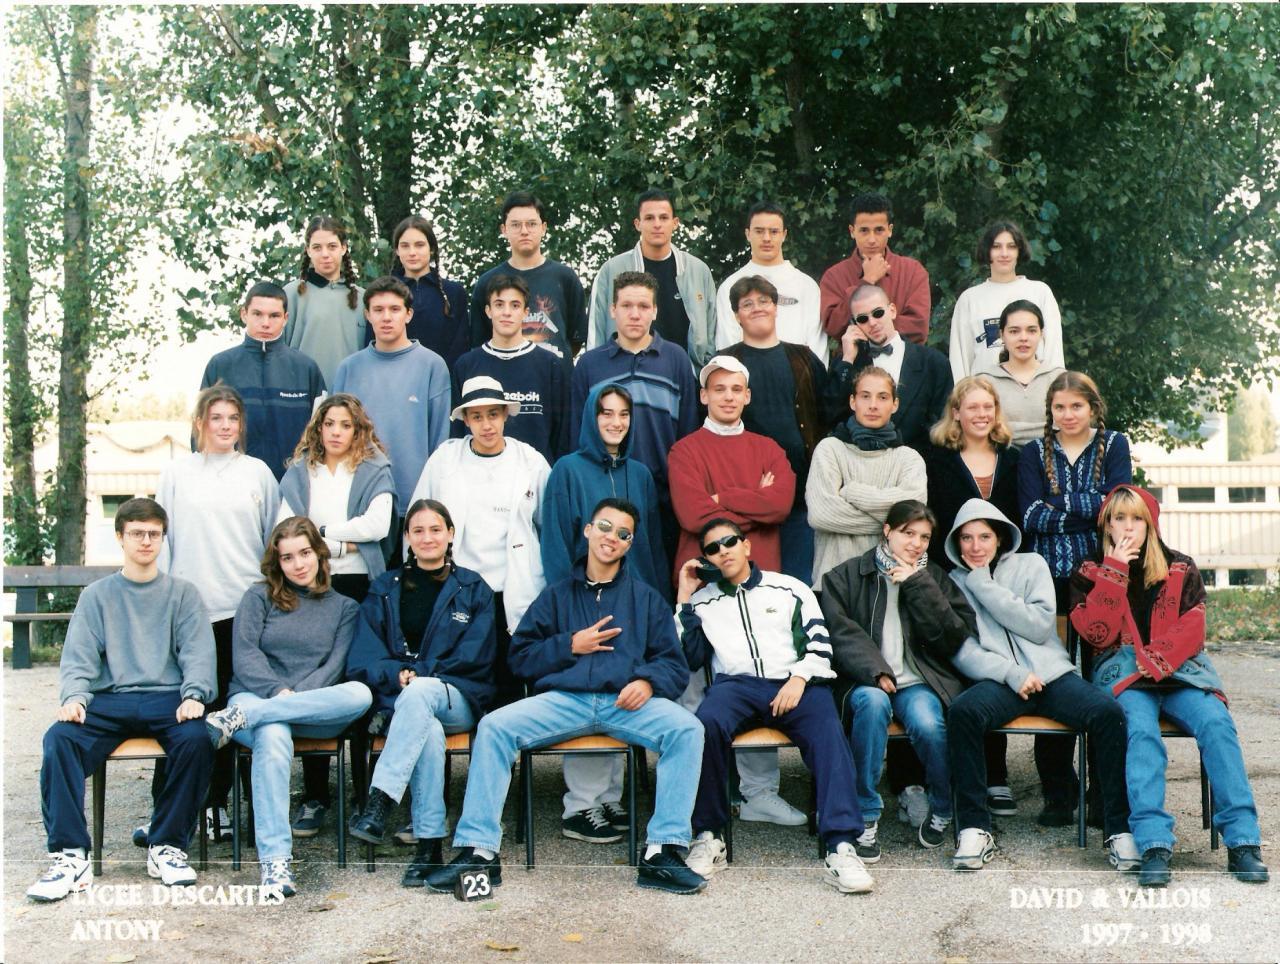 1998 - 1ES2 - DAVID